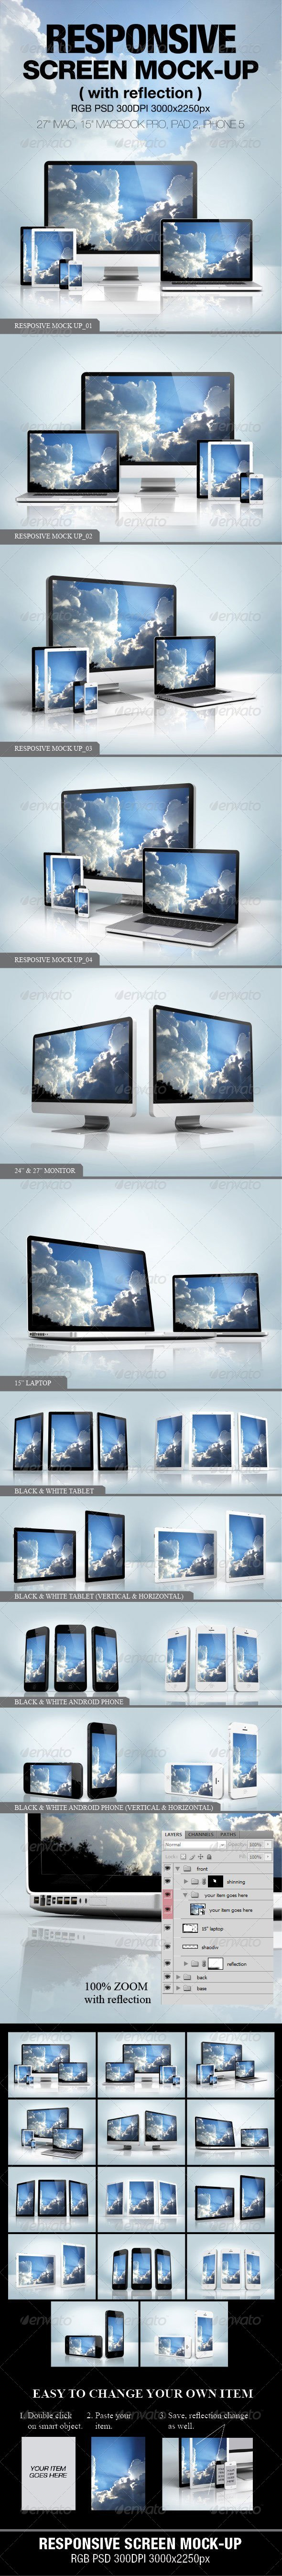 Responsive Screen Mock-up - Multiple Displays